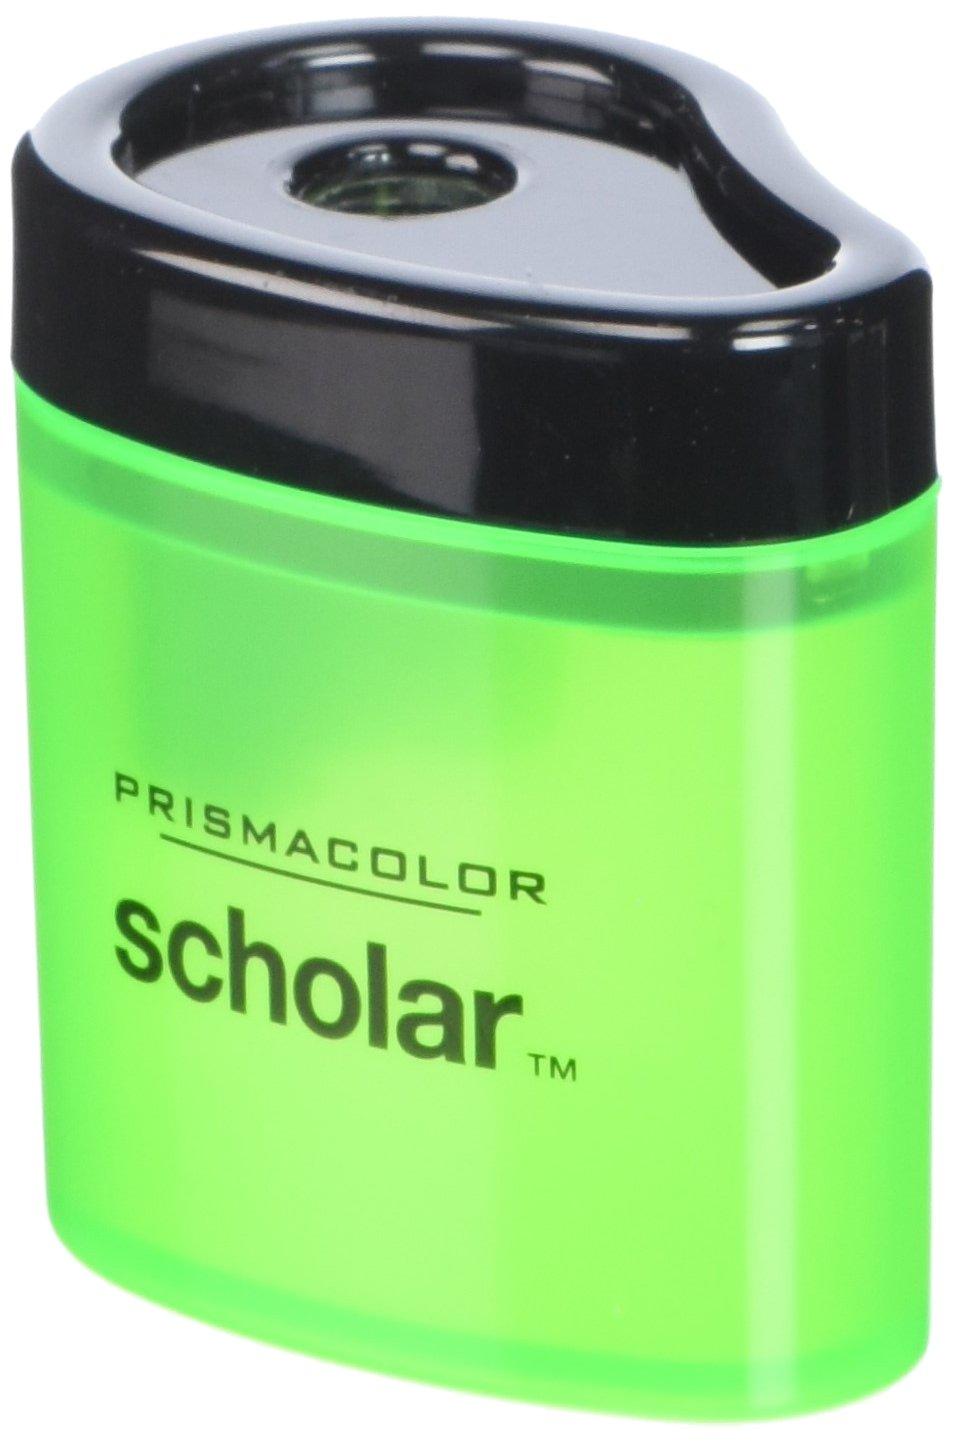 Prismacolor Scholar Colored Pencil Sharpener